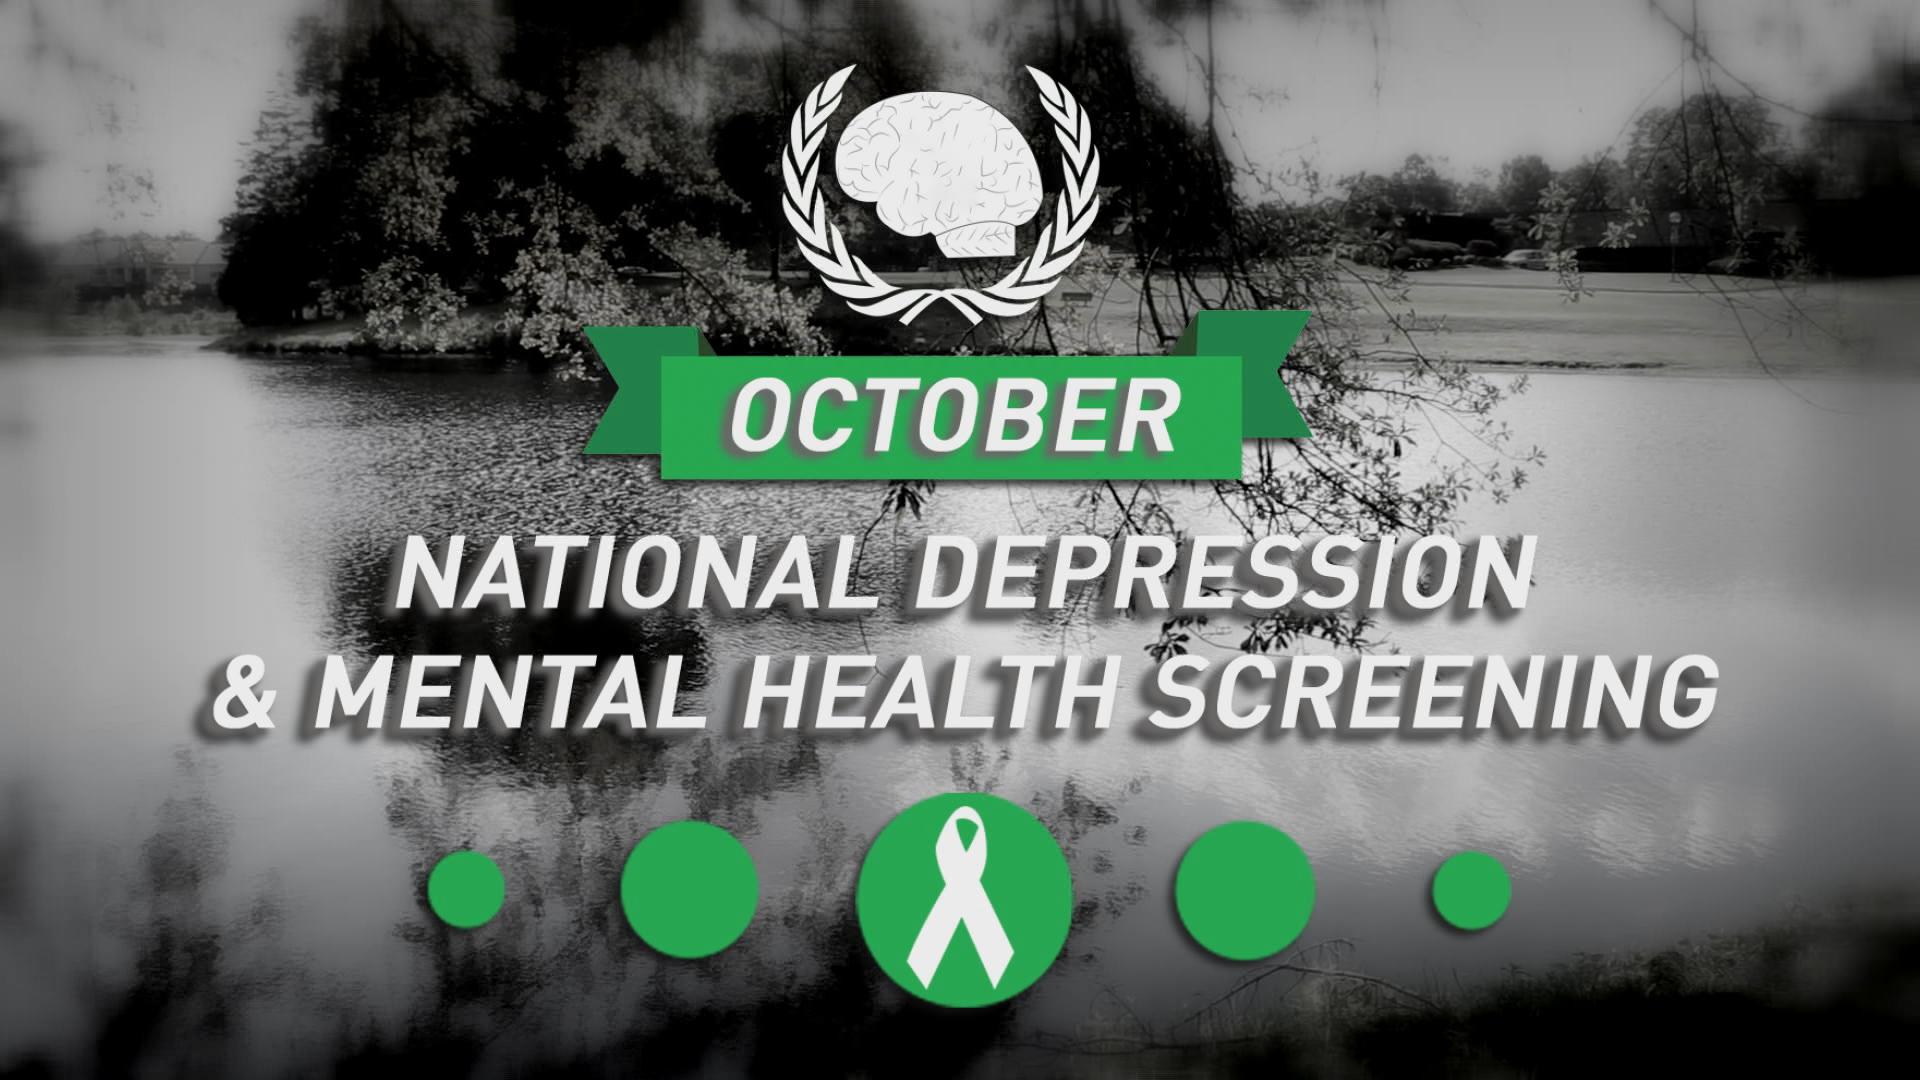 October: Nat'l Depression & Mental Health Screening Month